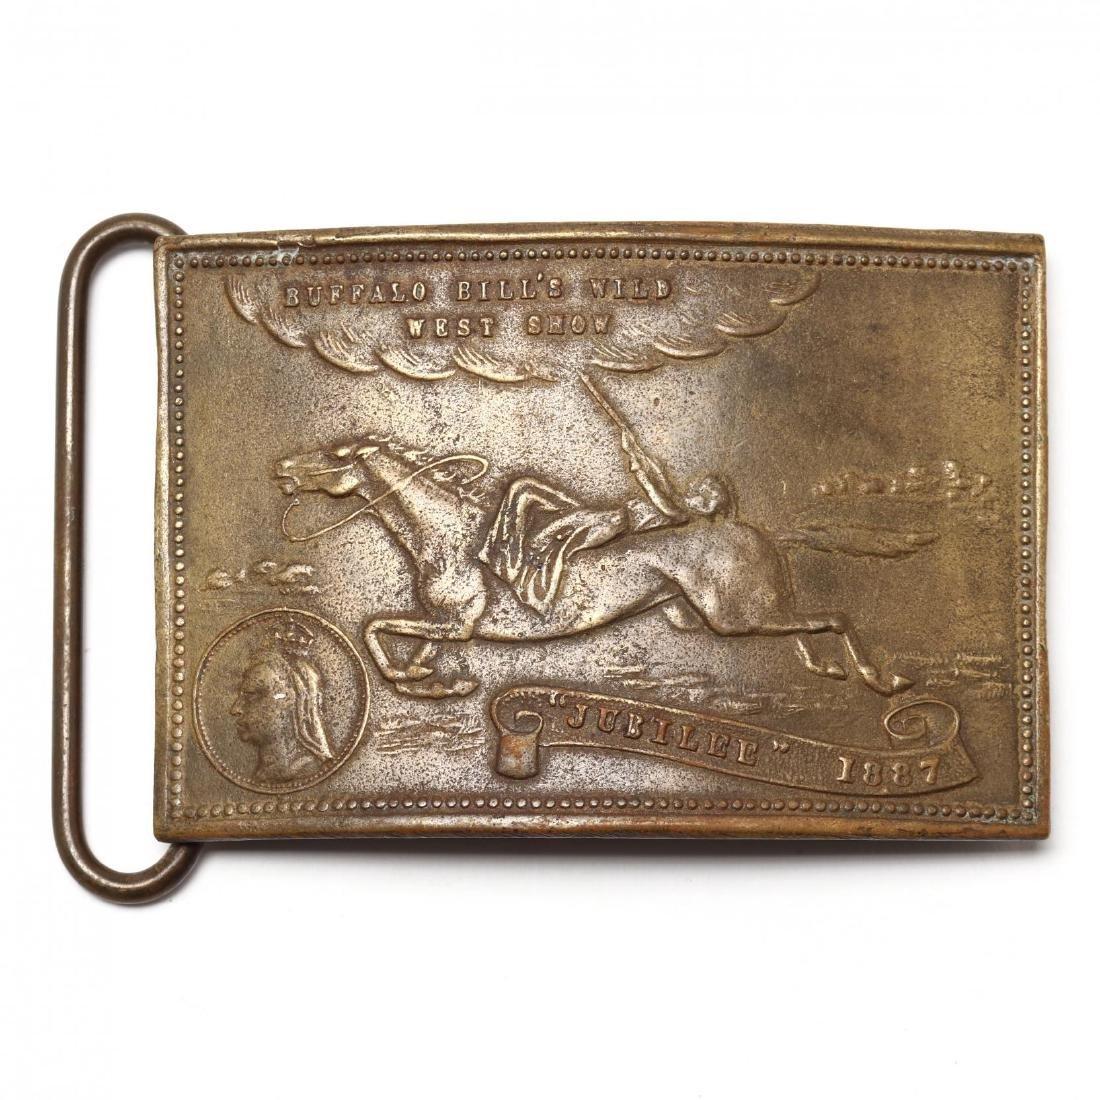 Four Antique Belt Buckles, Including Tiffany - 6